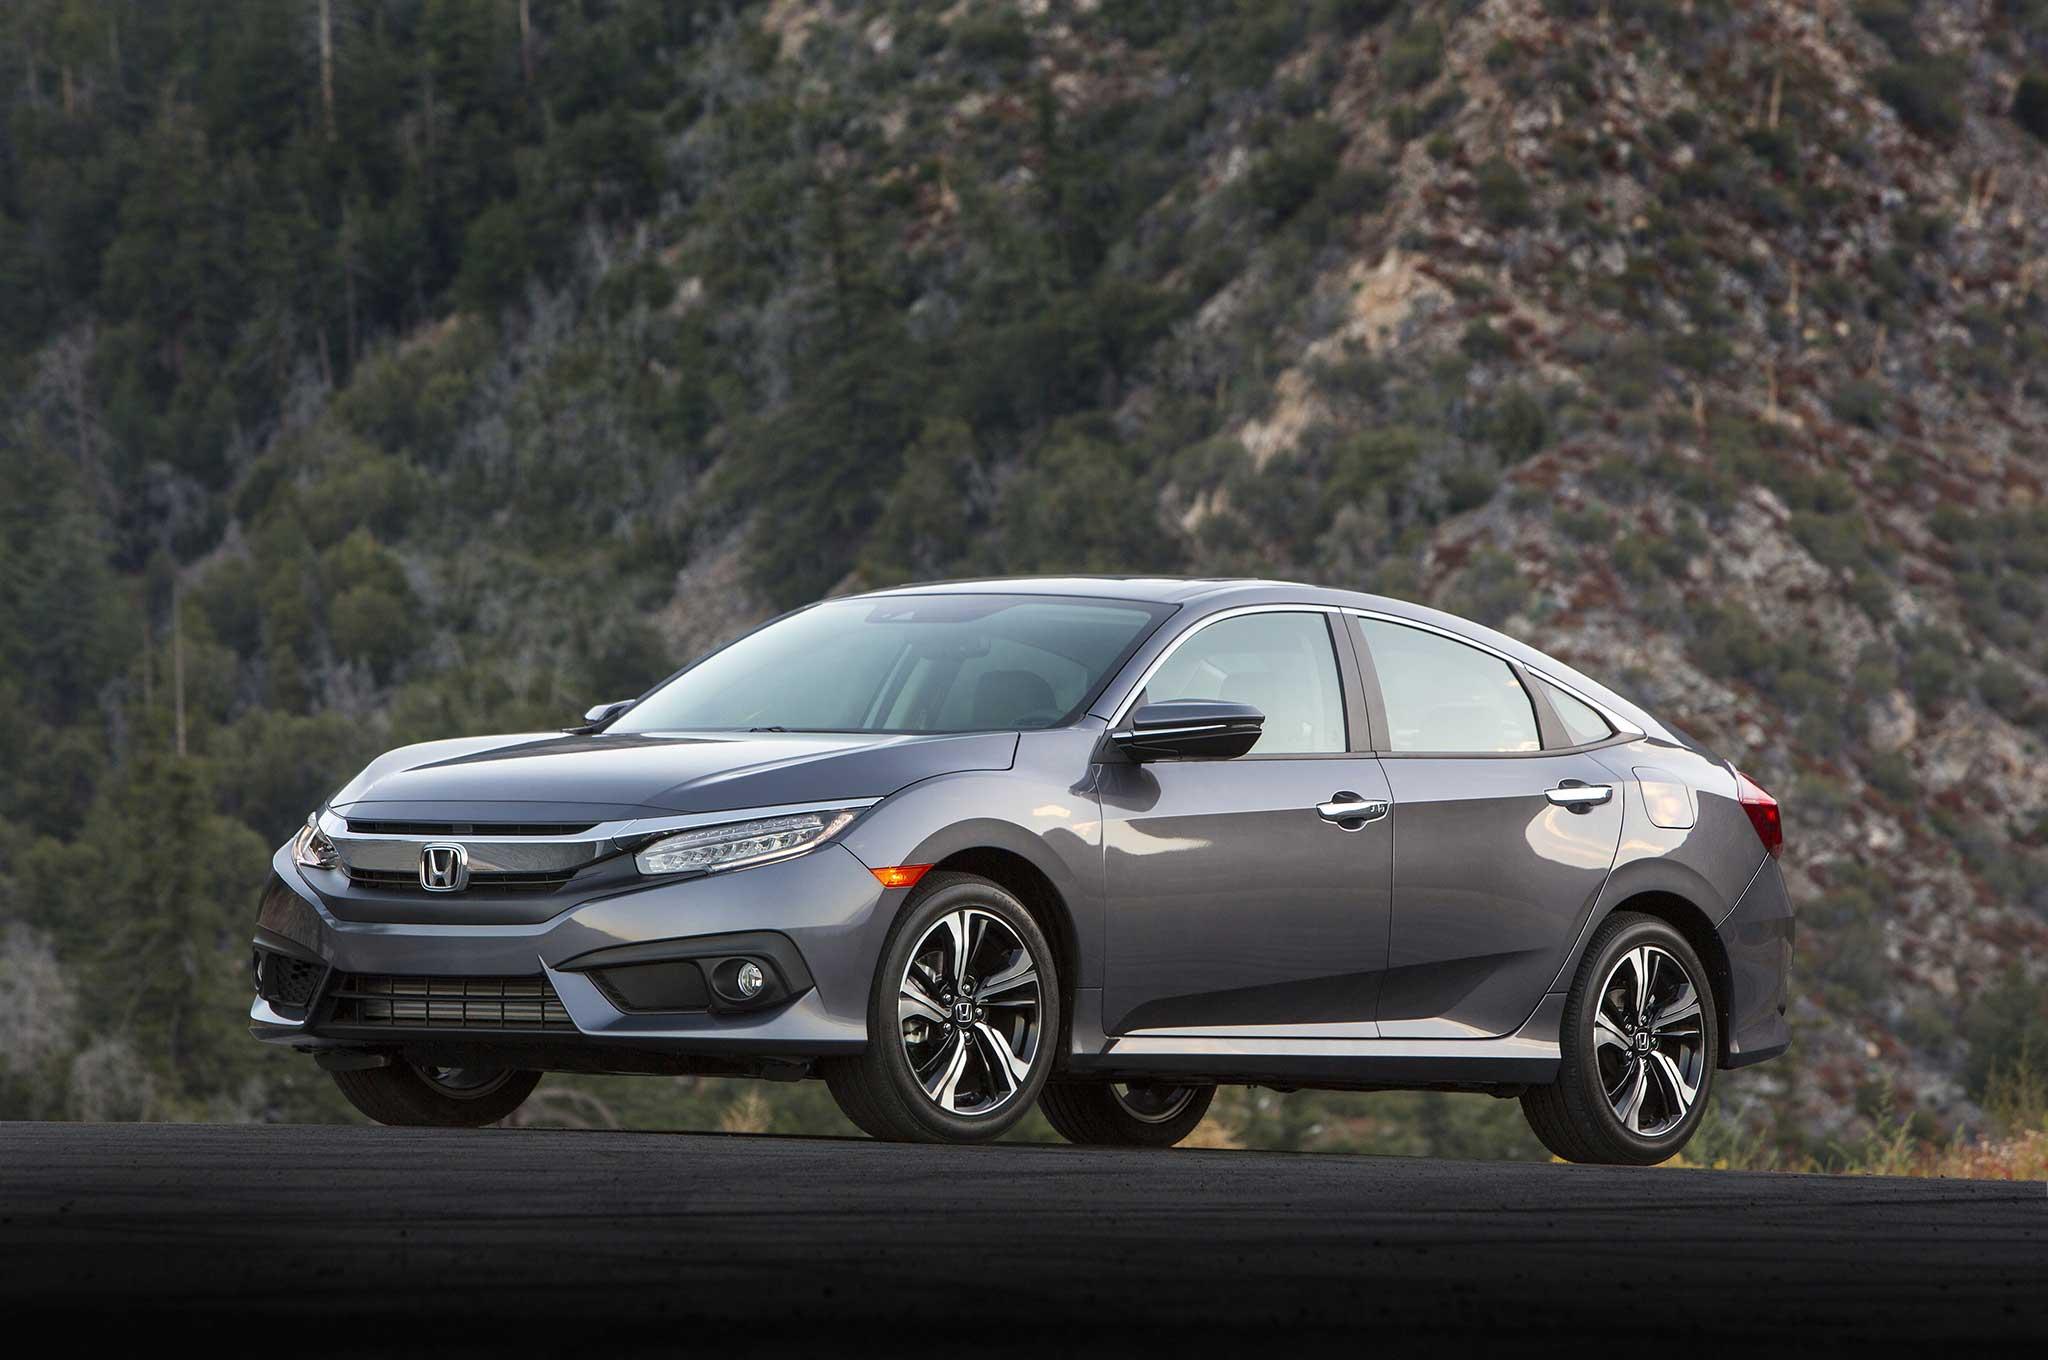 10th Gen Civic >> Honda Civic History 10 Generations